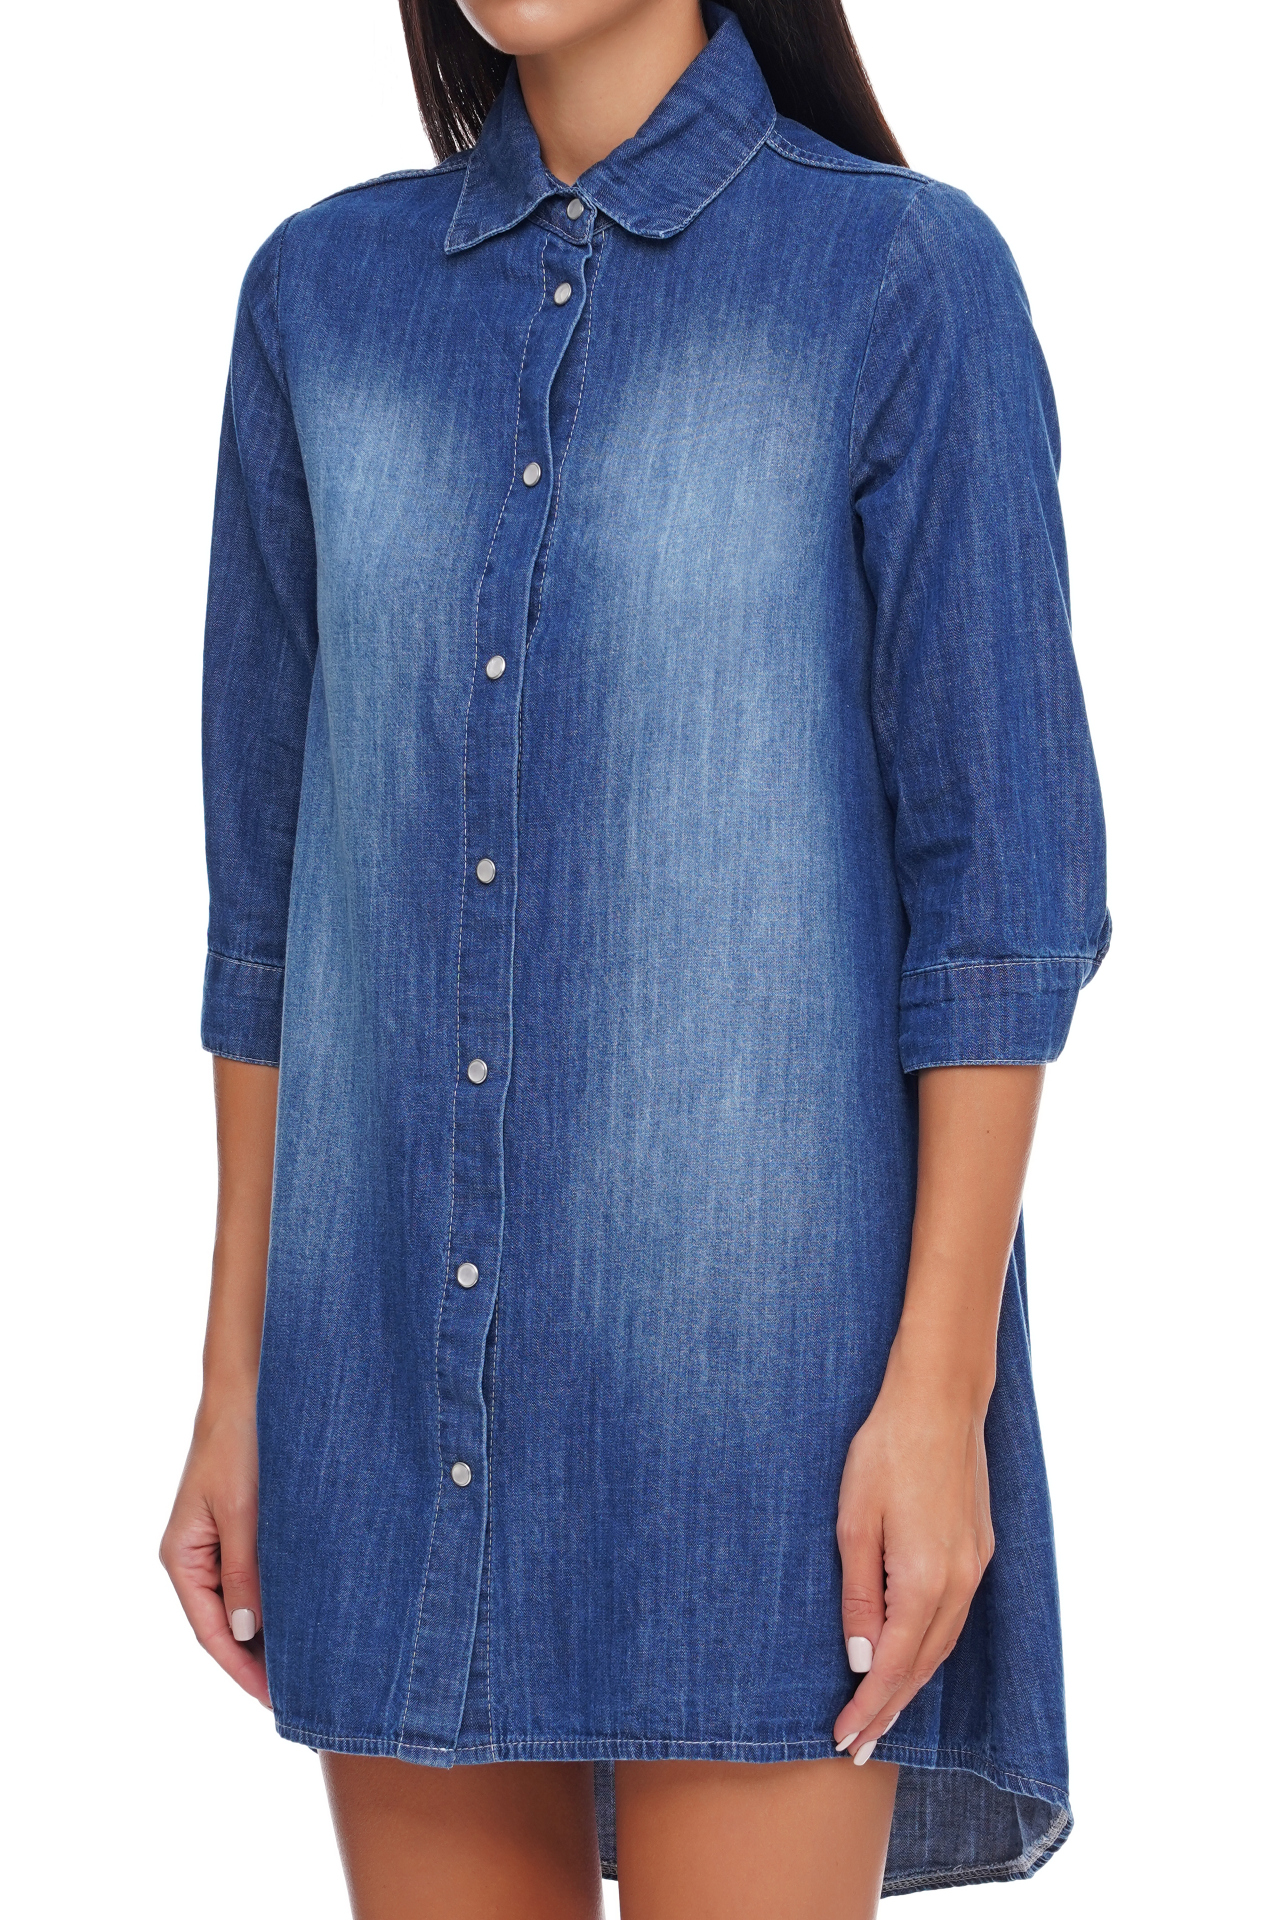 Le Streghe Jeans Hemd Kleid